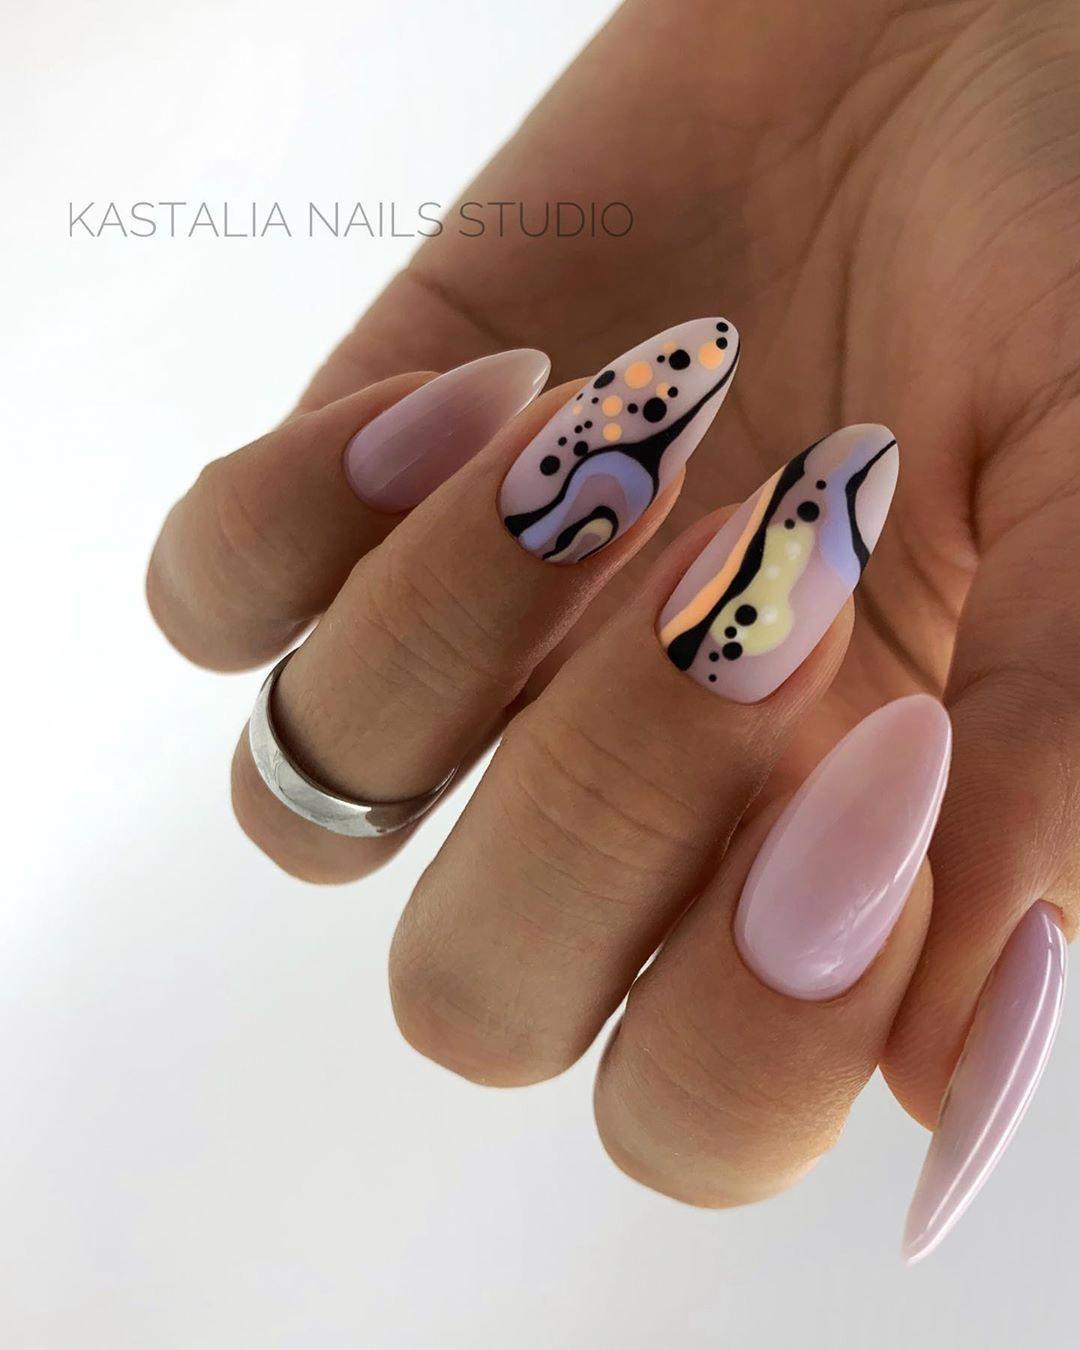 Nails Glitternails Gelnails Coffinnails Nails Nailswag Nailstagram Nailart Naildesigns Nailaddict Nailsofinstagram Nailsonfleek Ma Perfect Nails Nail Designs Manicure